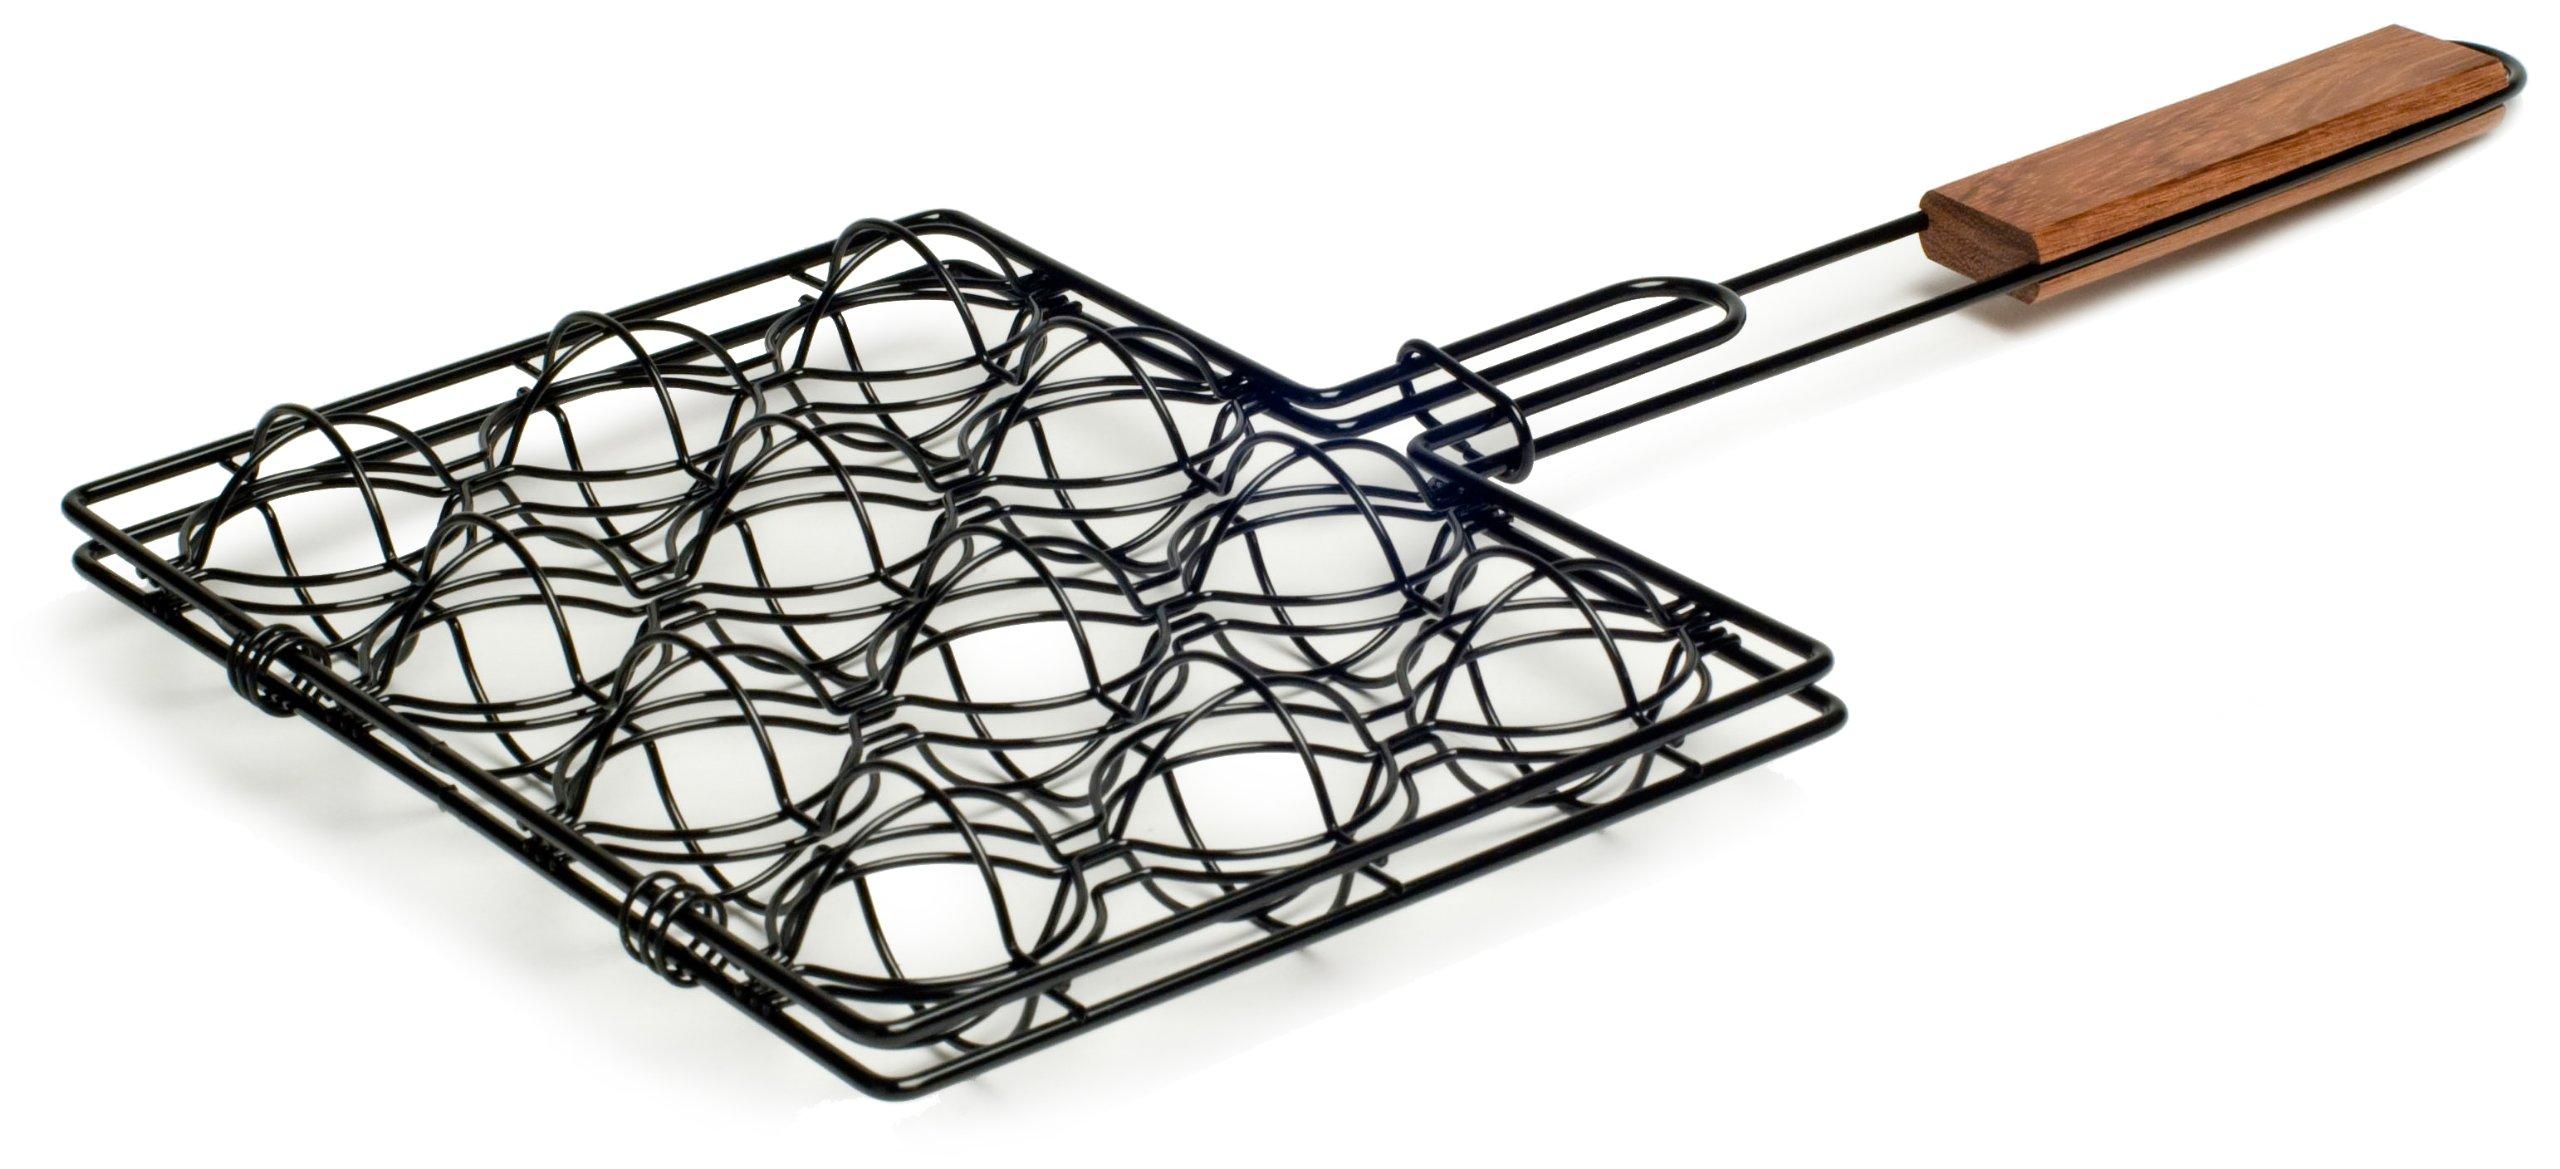 Charcoal Companion CC3504 Non-Stick Meatball Basket